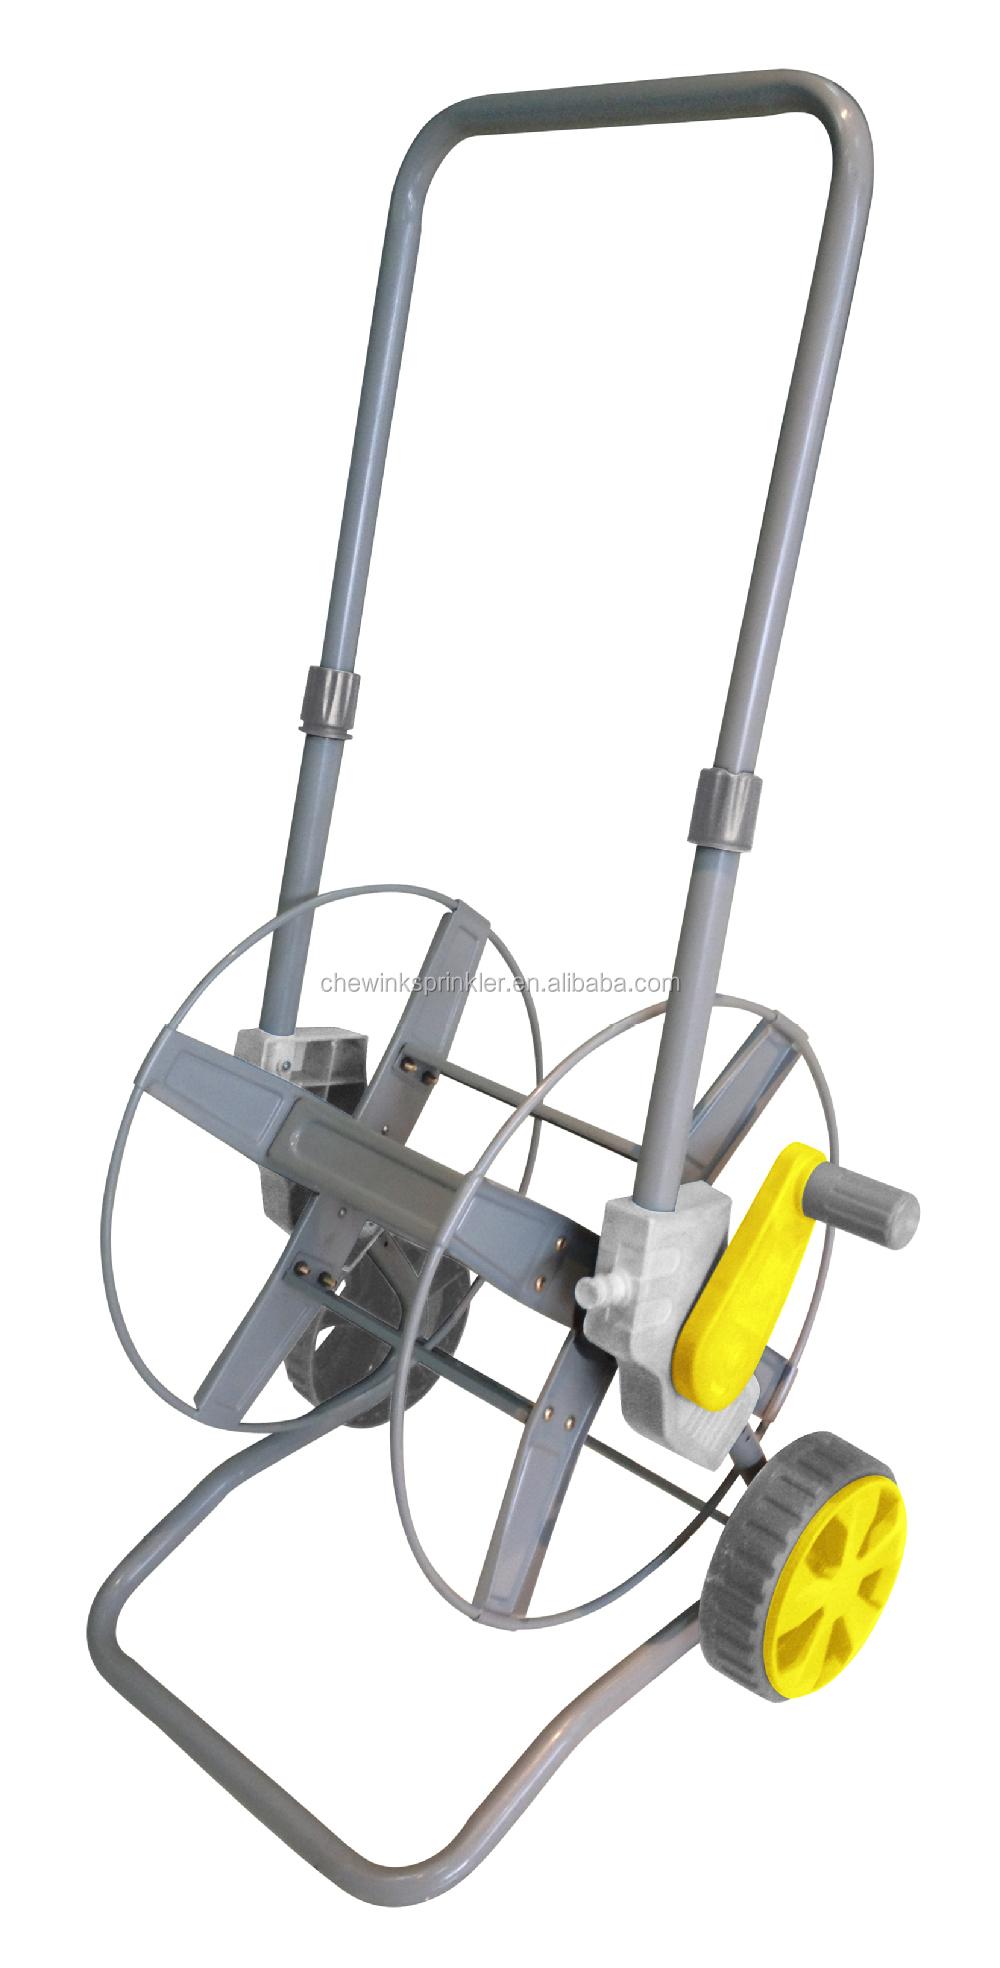 P20103 Metal Garden Manual Foldable Hose Reel Cart Buy Garden Hose Reel Cart Metal Hose Reel